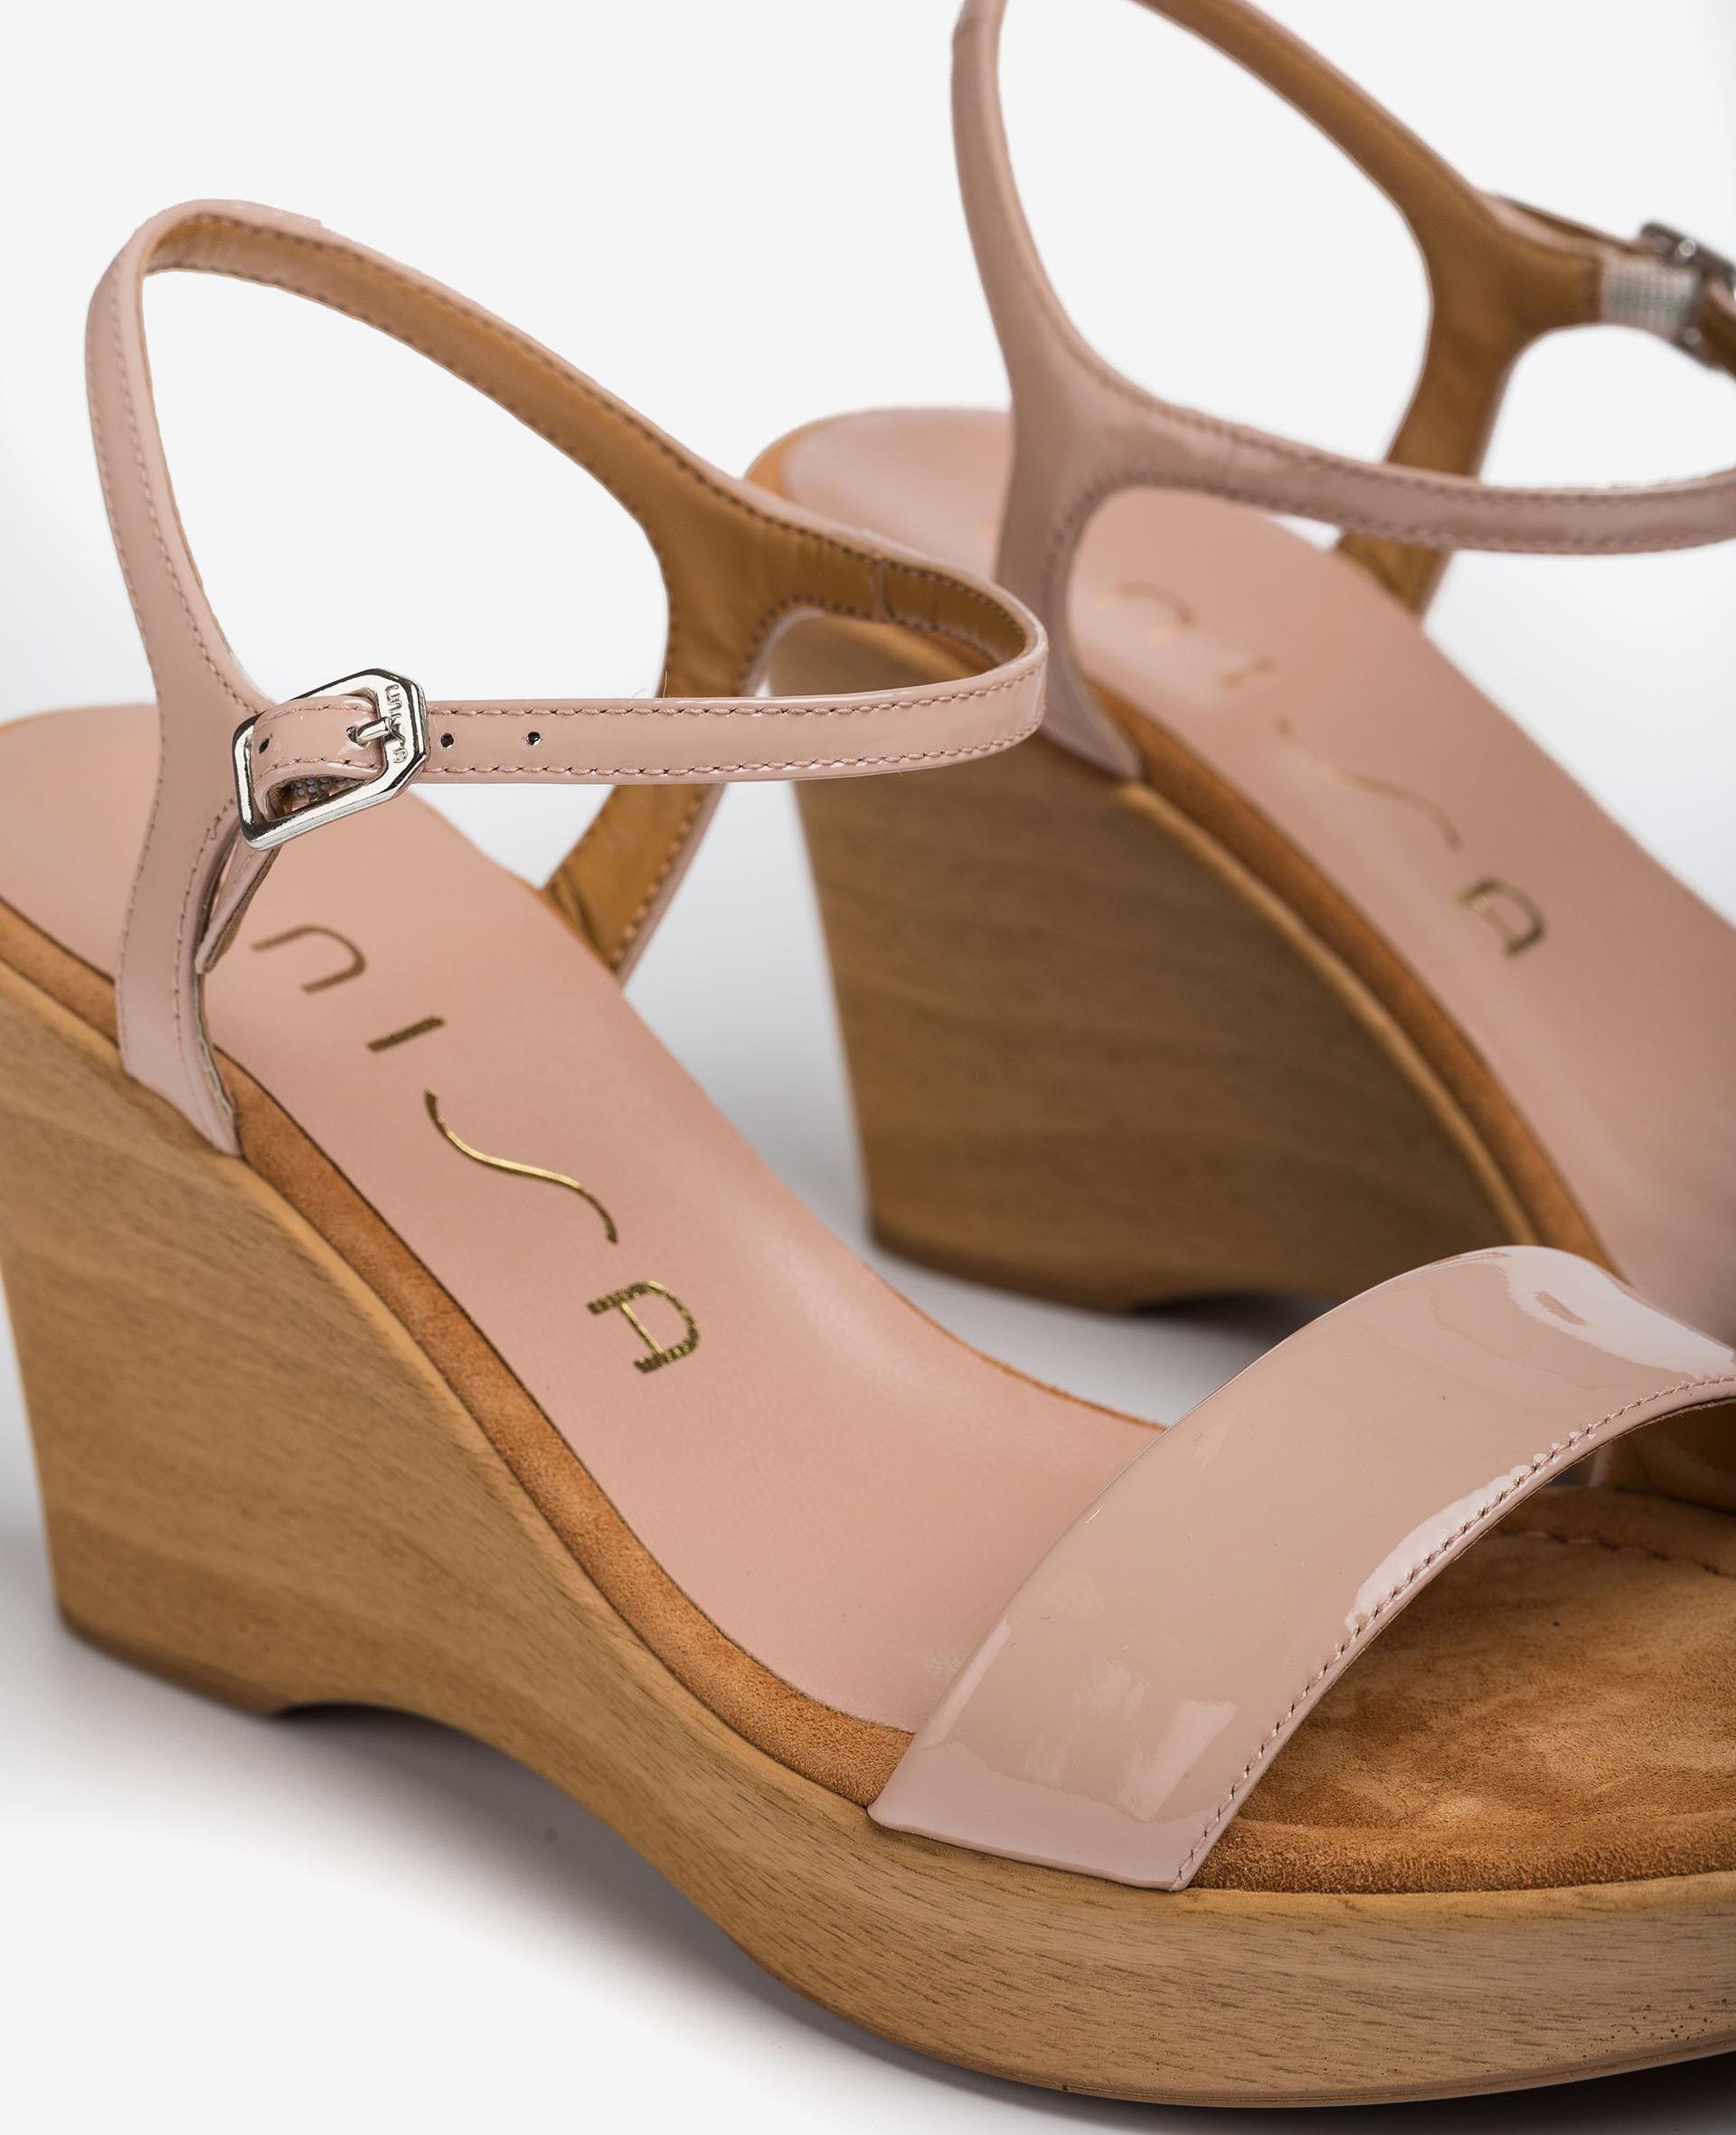 UNISA Patent leather wedge sandals RITA_21_PA 2